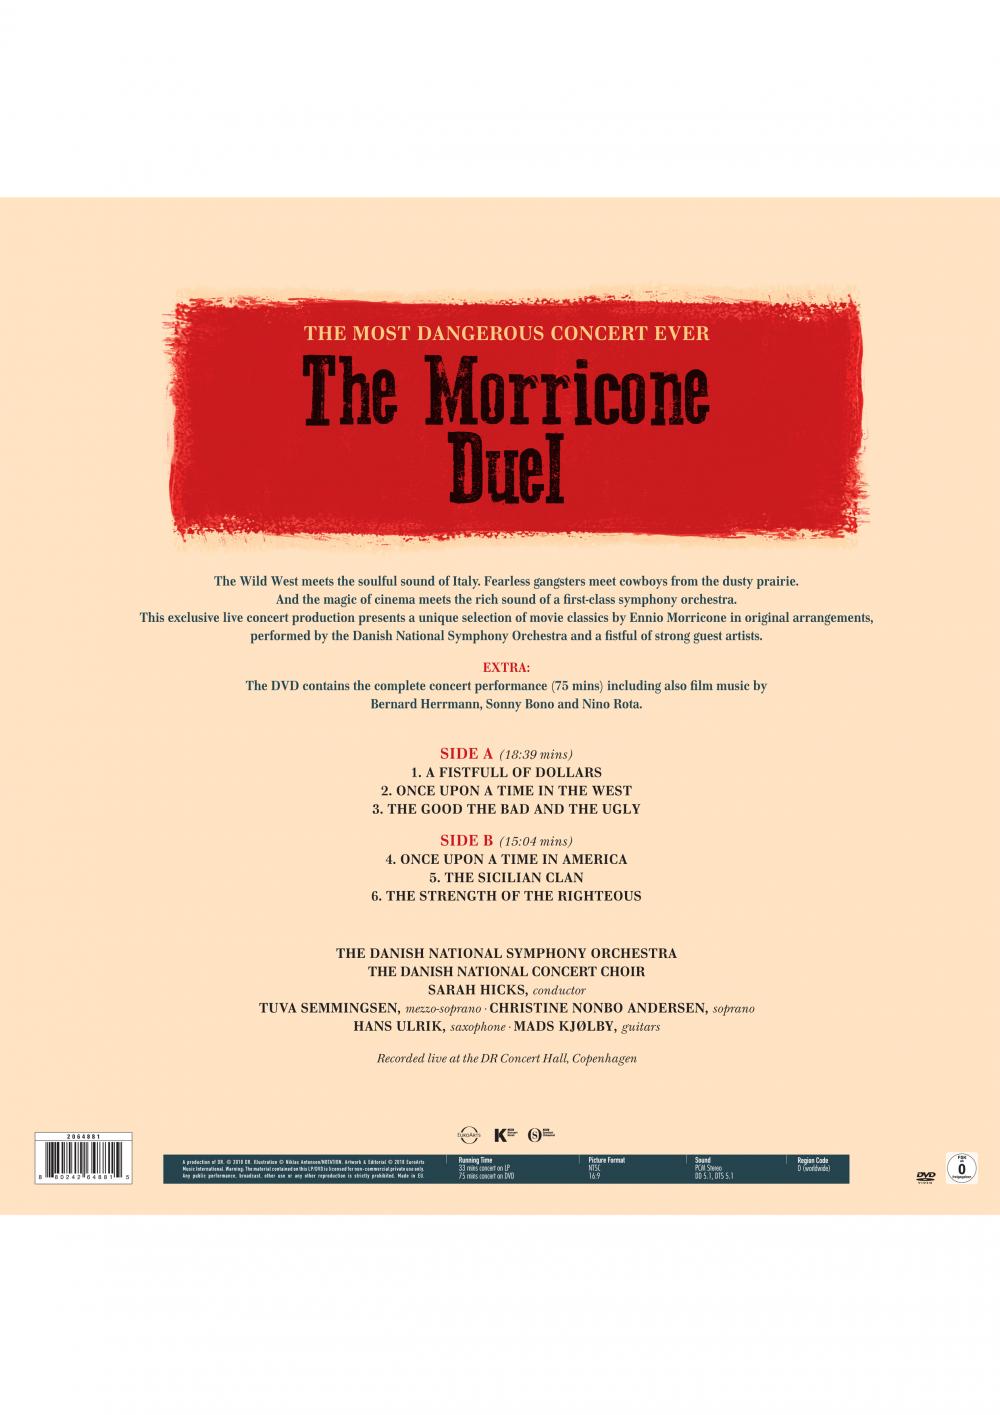 The Morricone Duel - The most dangerous concert ever Vinyl